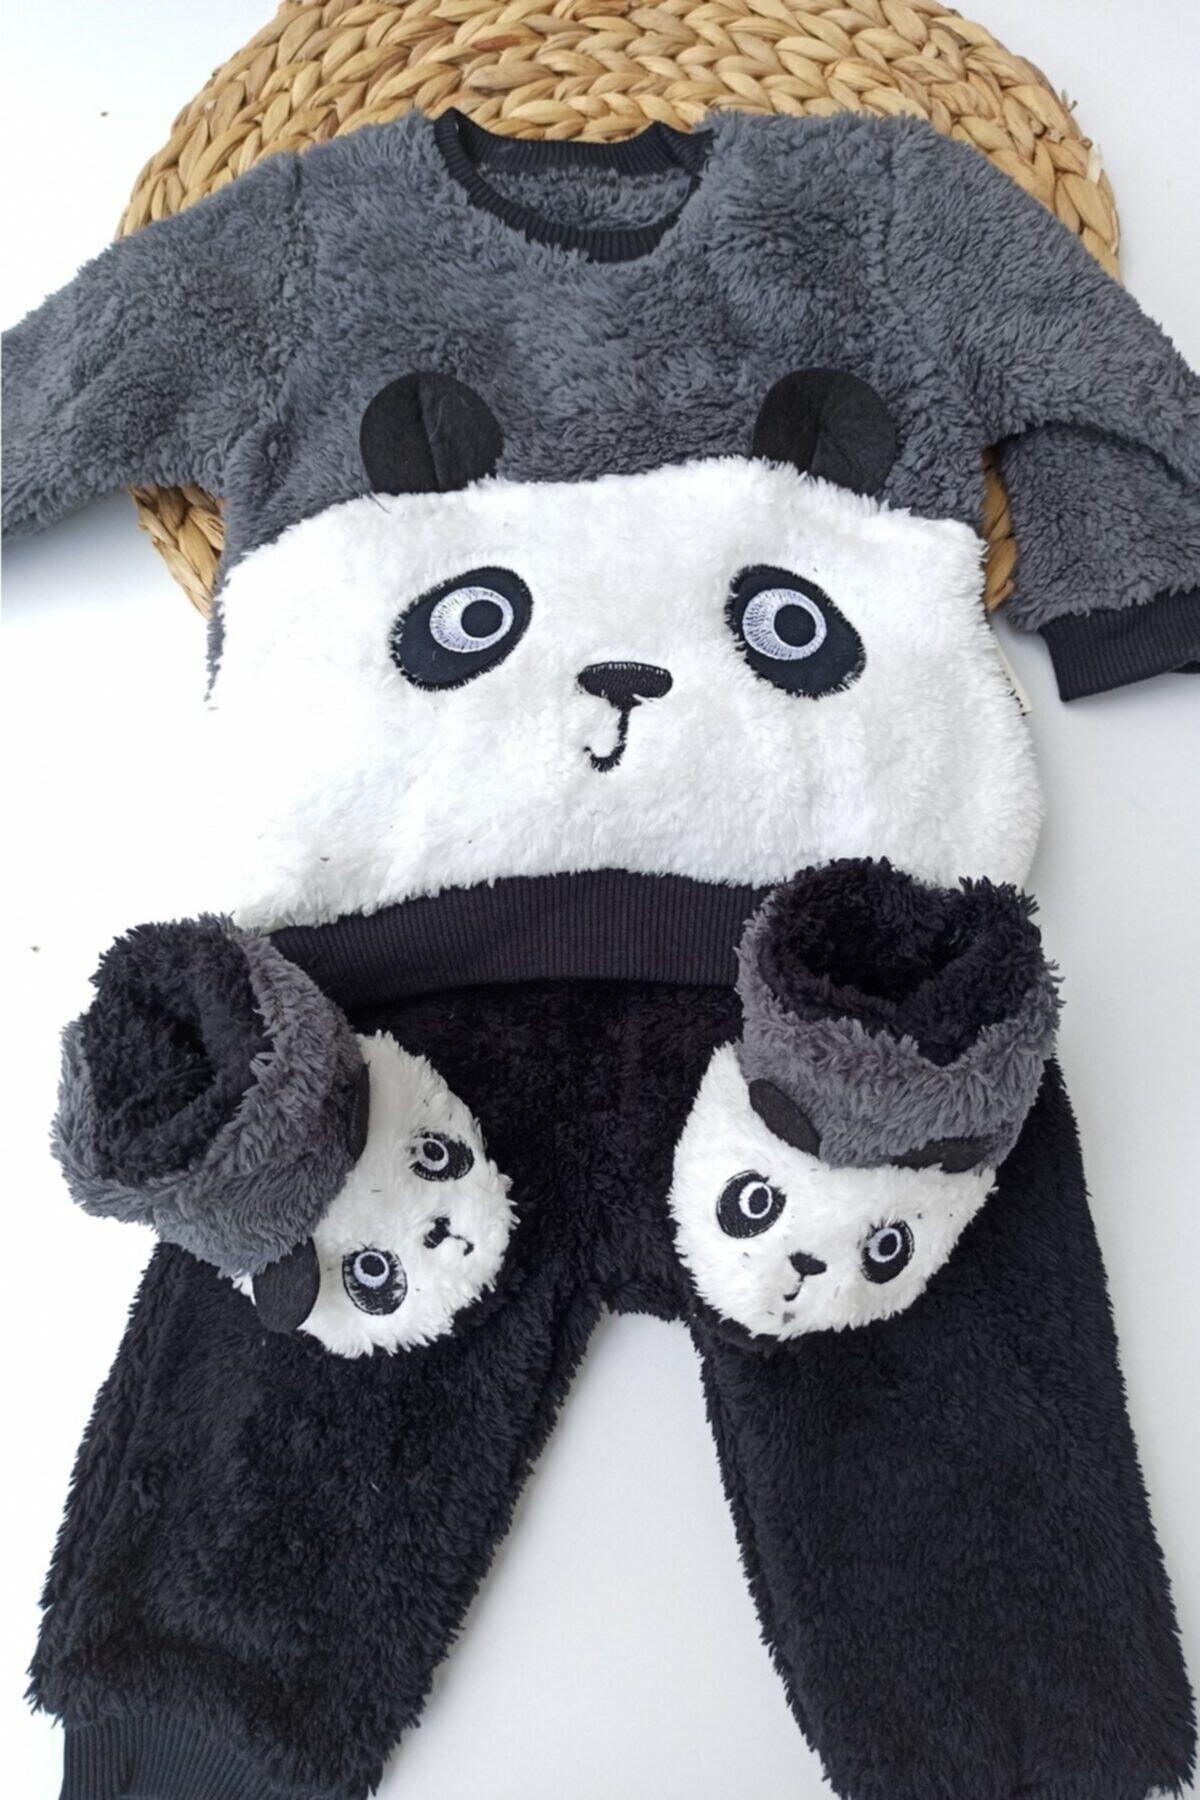 Necix Unisex Gri Panda Desenli Kışlık Welsoft Panduflu Lüx Bebek Takımı 6-9-12 Ay 2